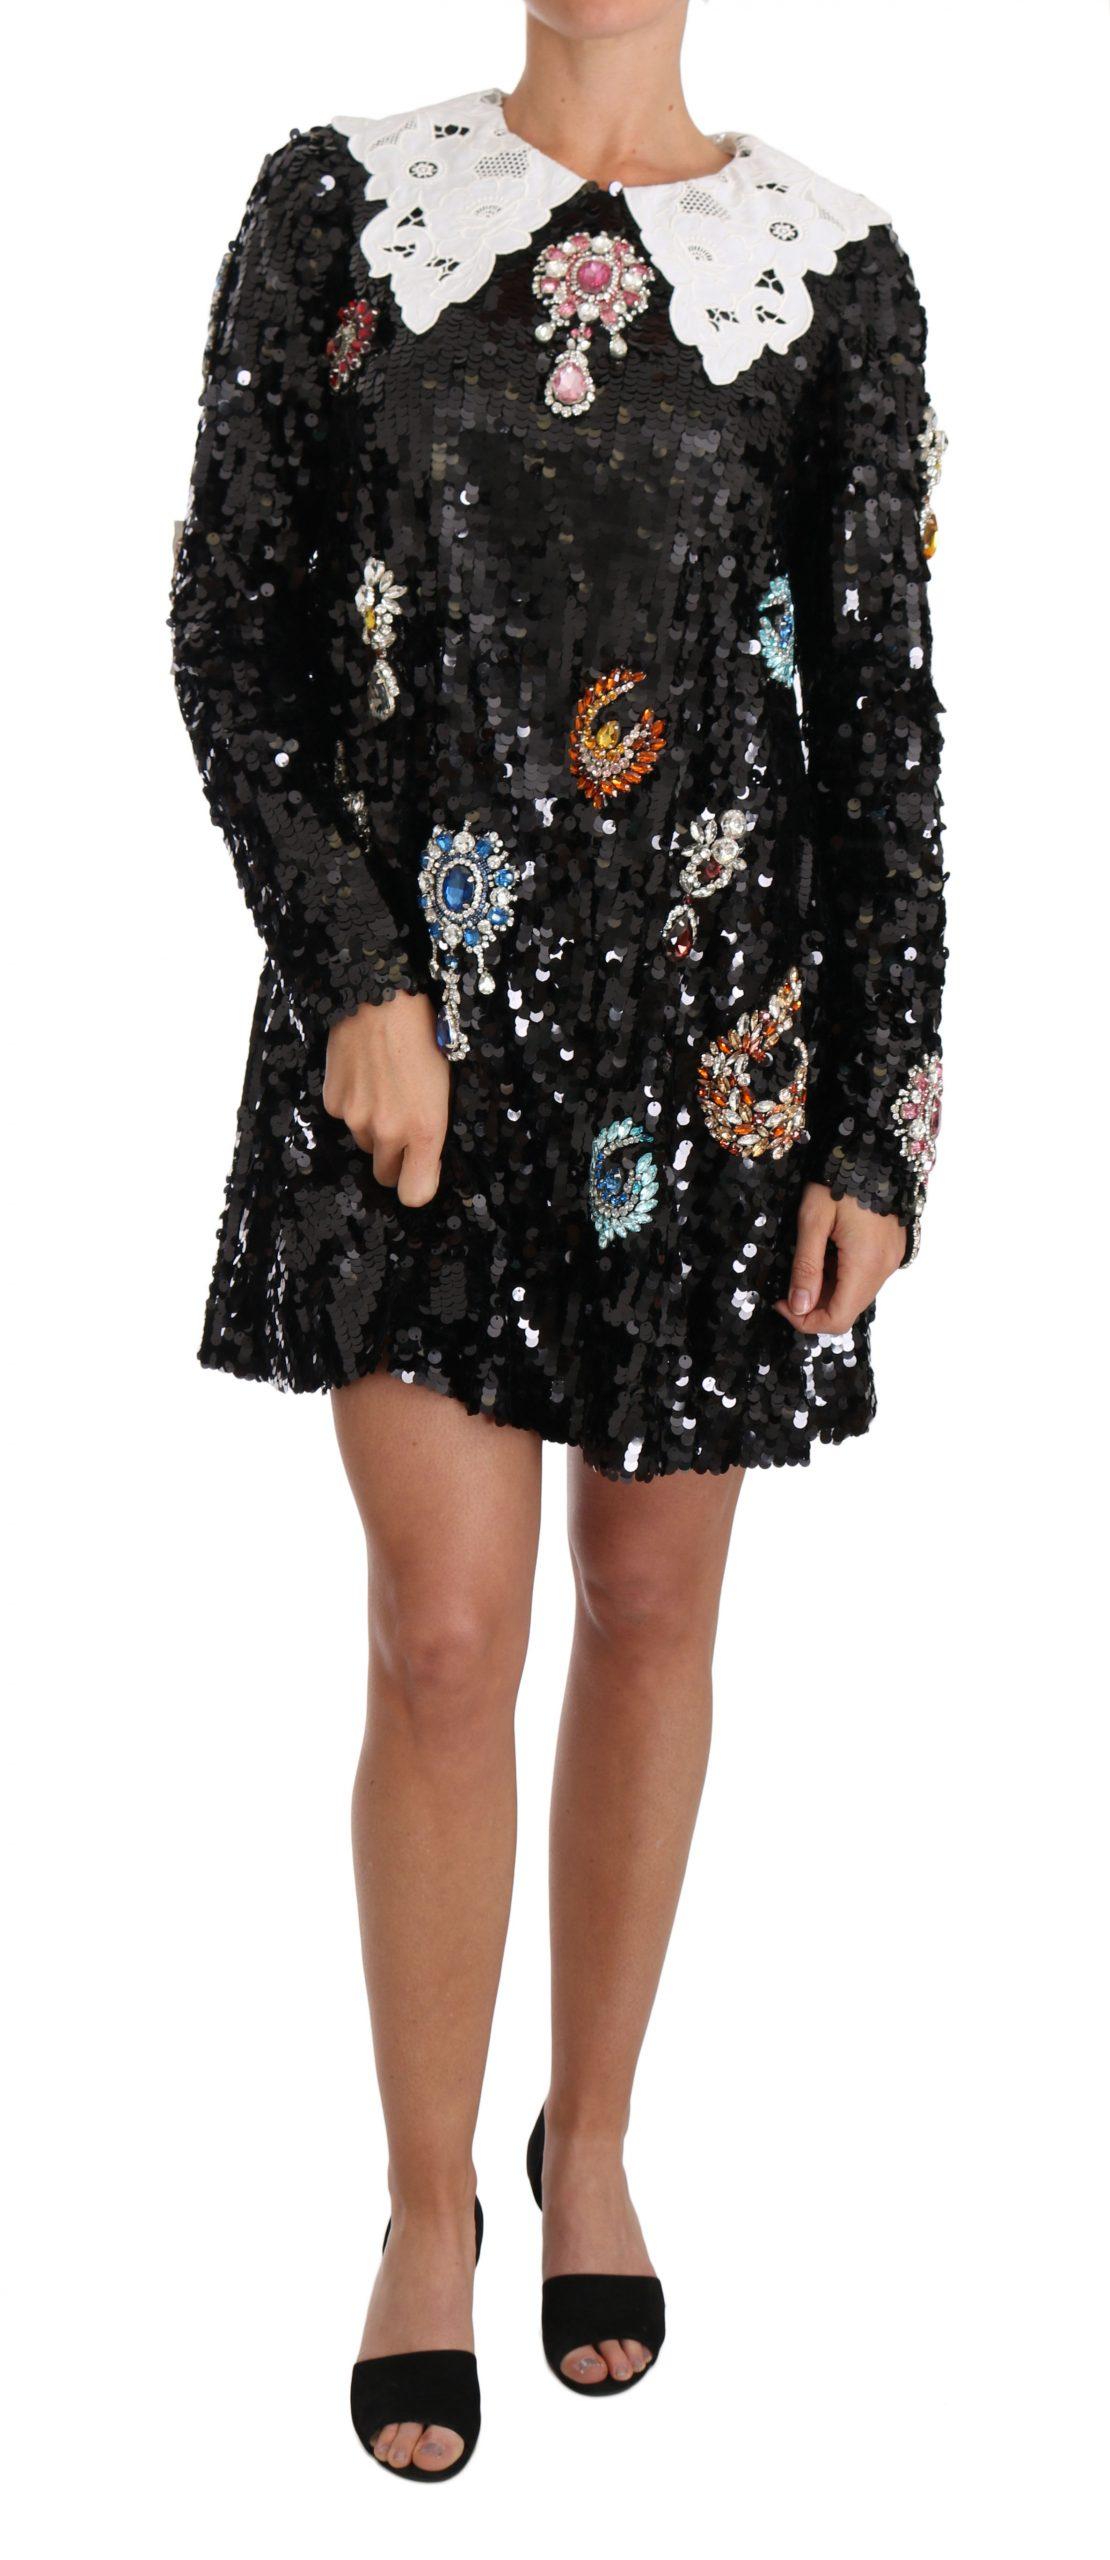 Dolce & Gabbana Women's Sequined Crystal Fairy Tale Dress Black DR1519 - IT40 S